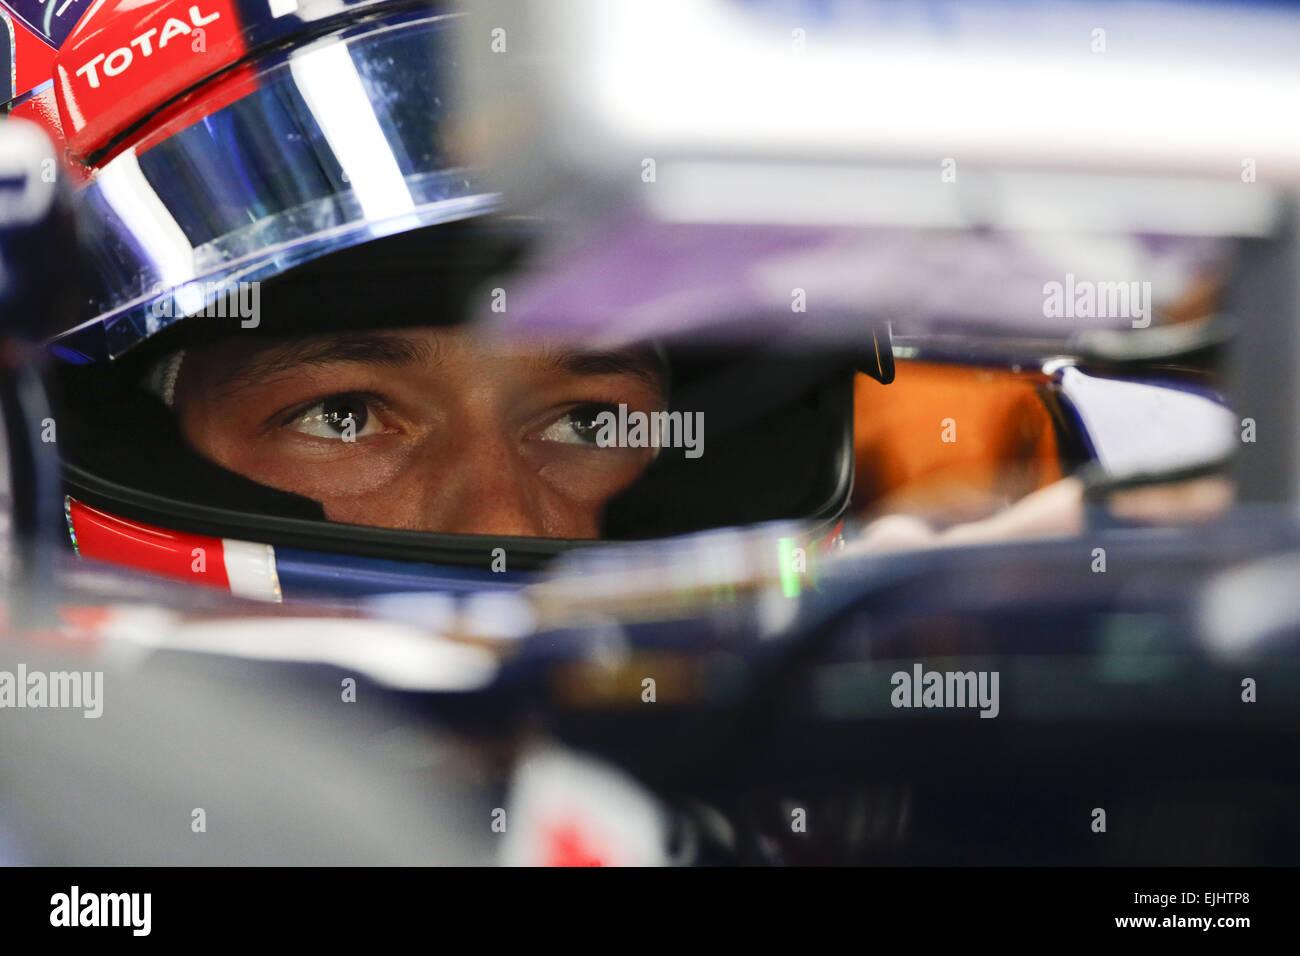 Sepang, Malasia. 27 Mar, 2015. DANIIL KVYAT de Rusia Infiniti y Red Bull Racing se ve sentado en el coche durante Imagen De Stock